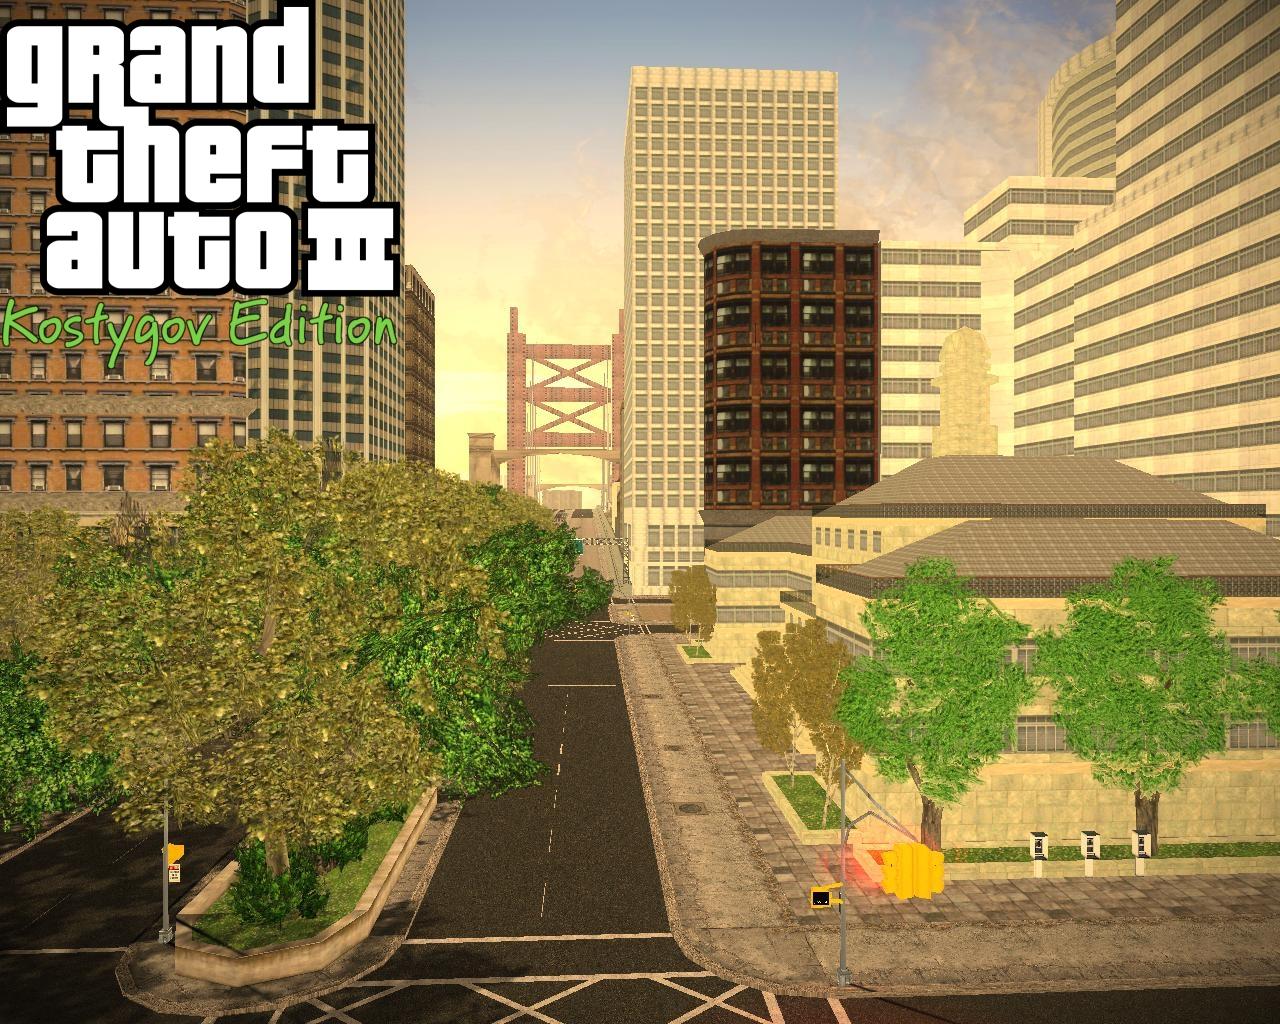 GTA3: Kostygov Edition - Grand Theft Auto 3